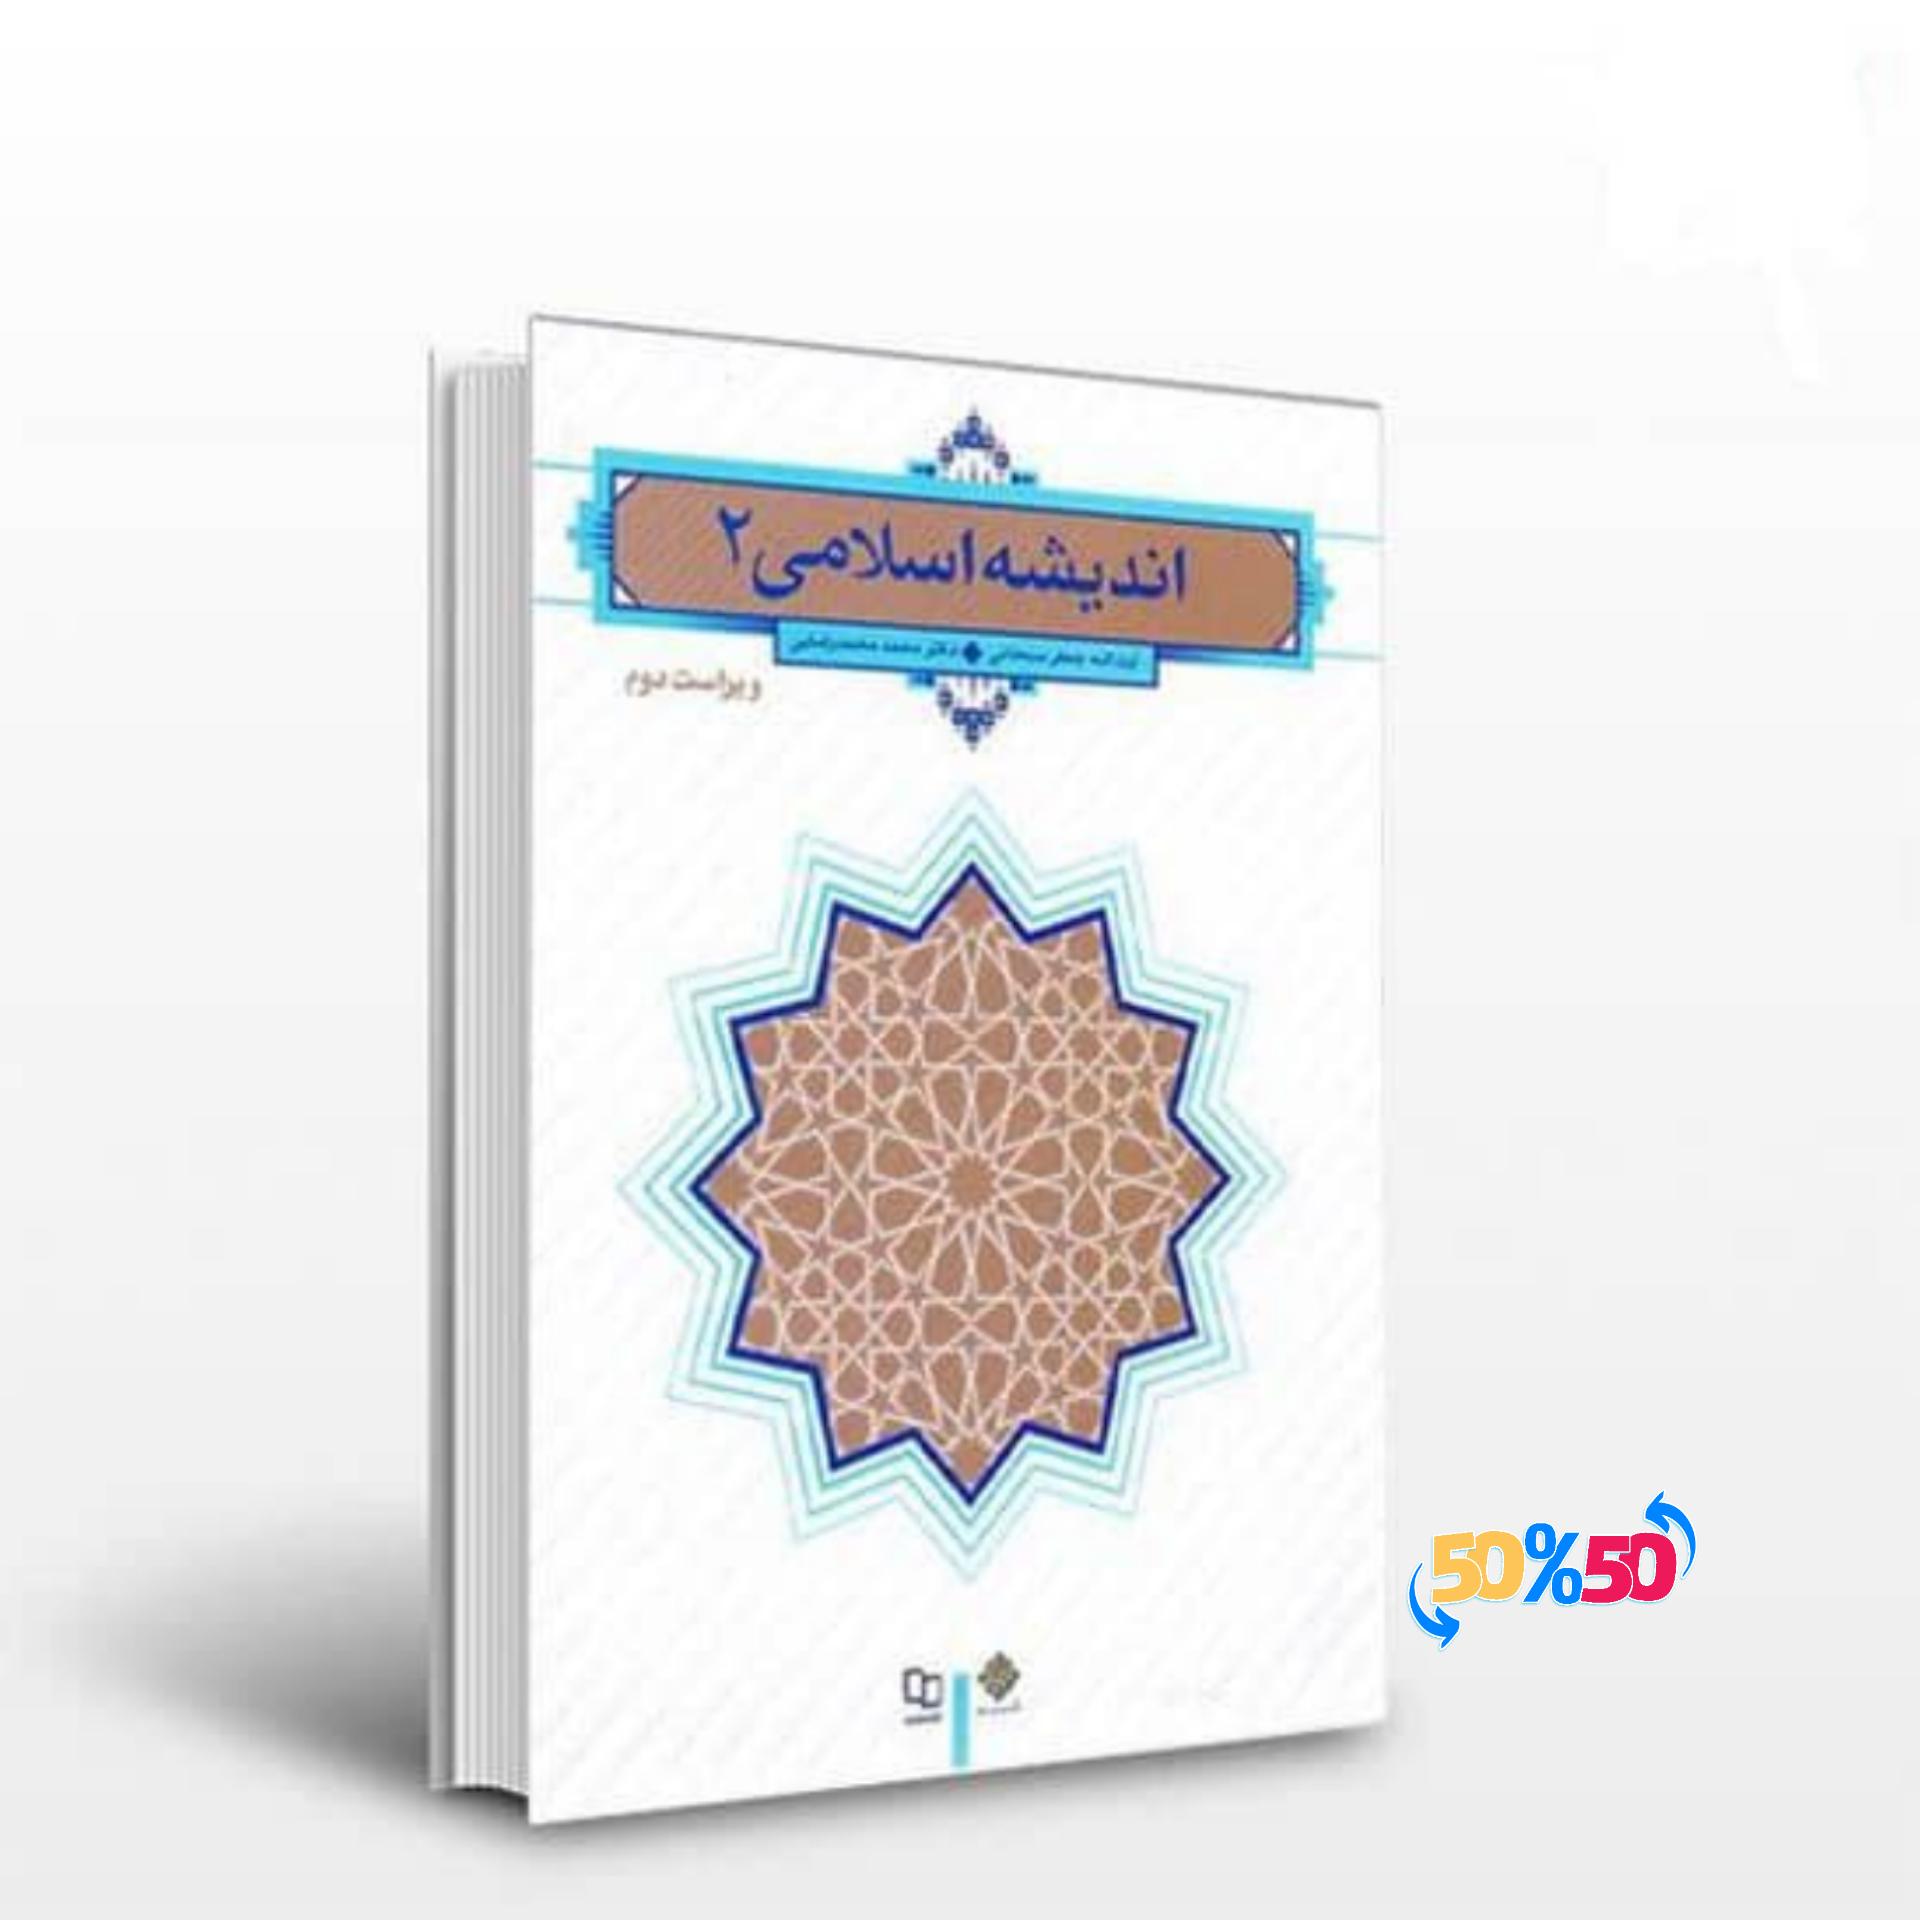 موارد امتحانی اندیشه اسلامی 2(قابل سرچ)